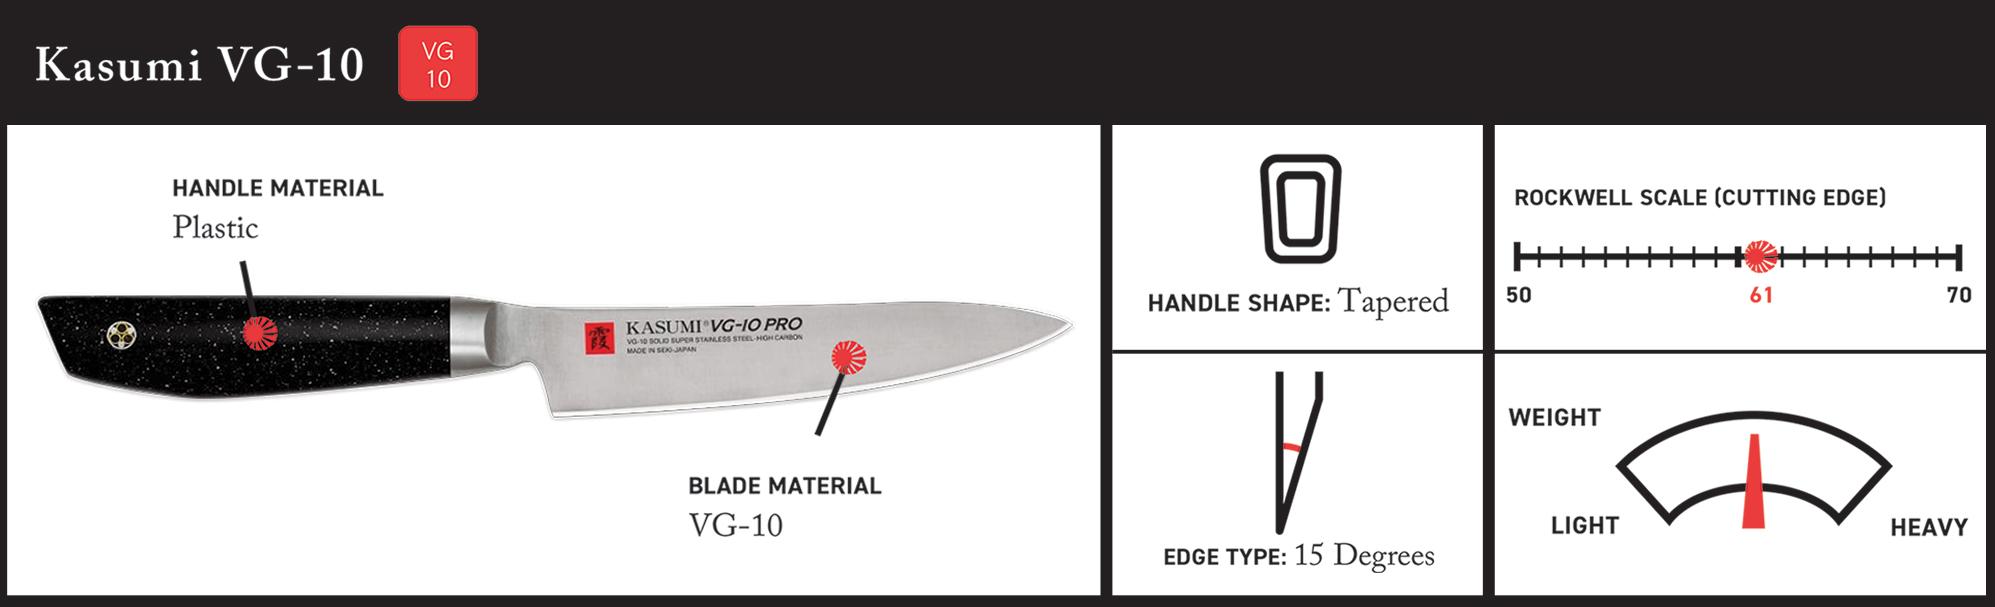 Kasumi VG-10 PRO Knives